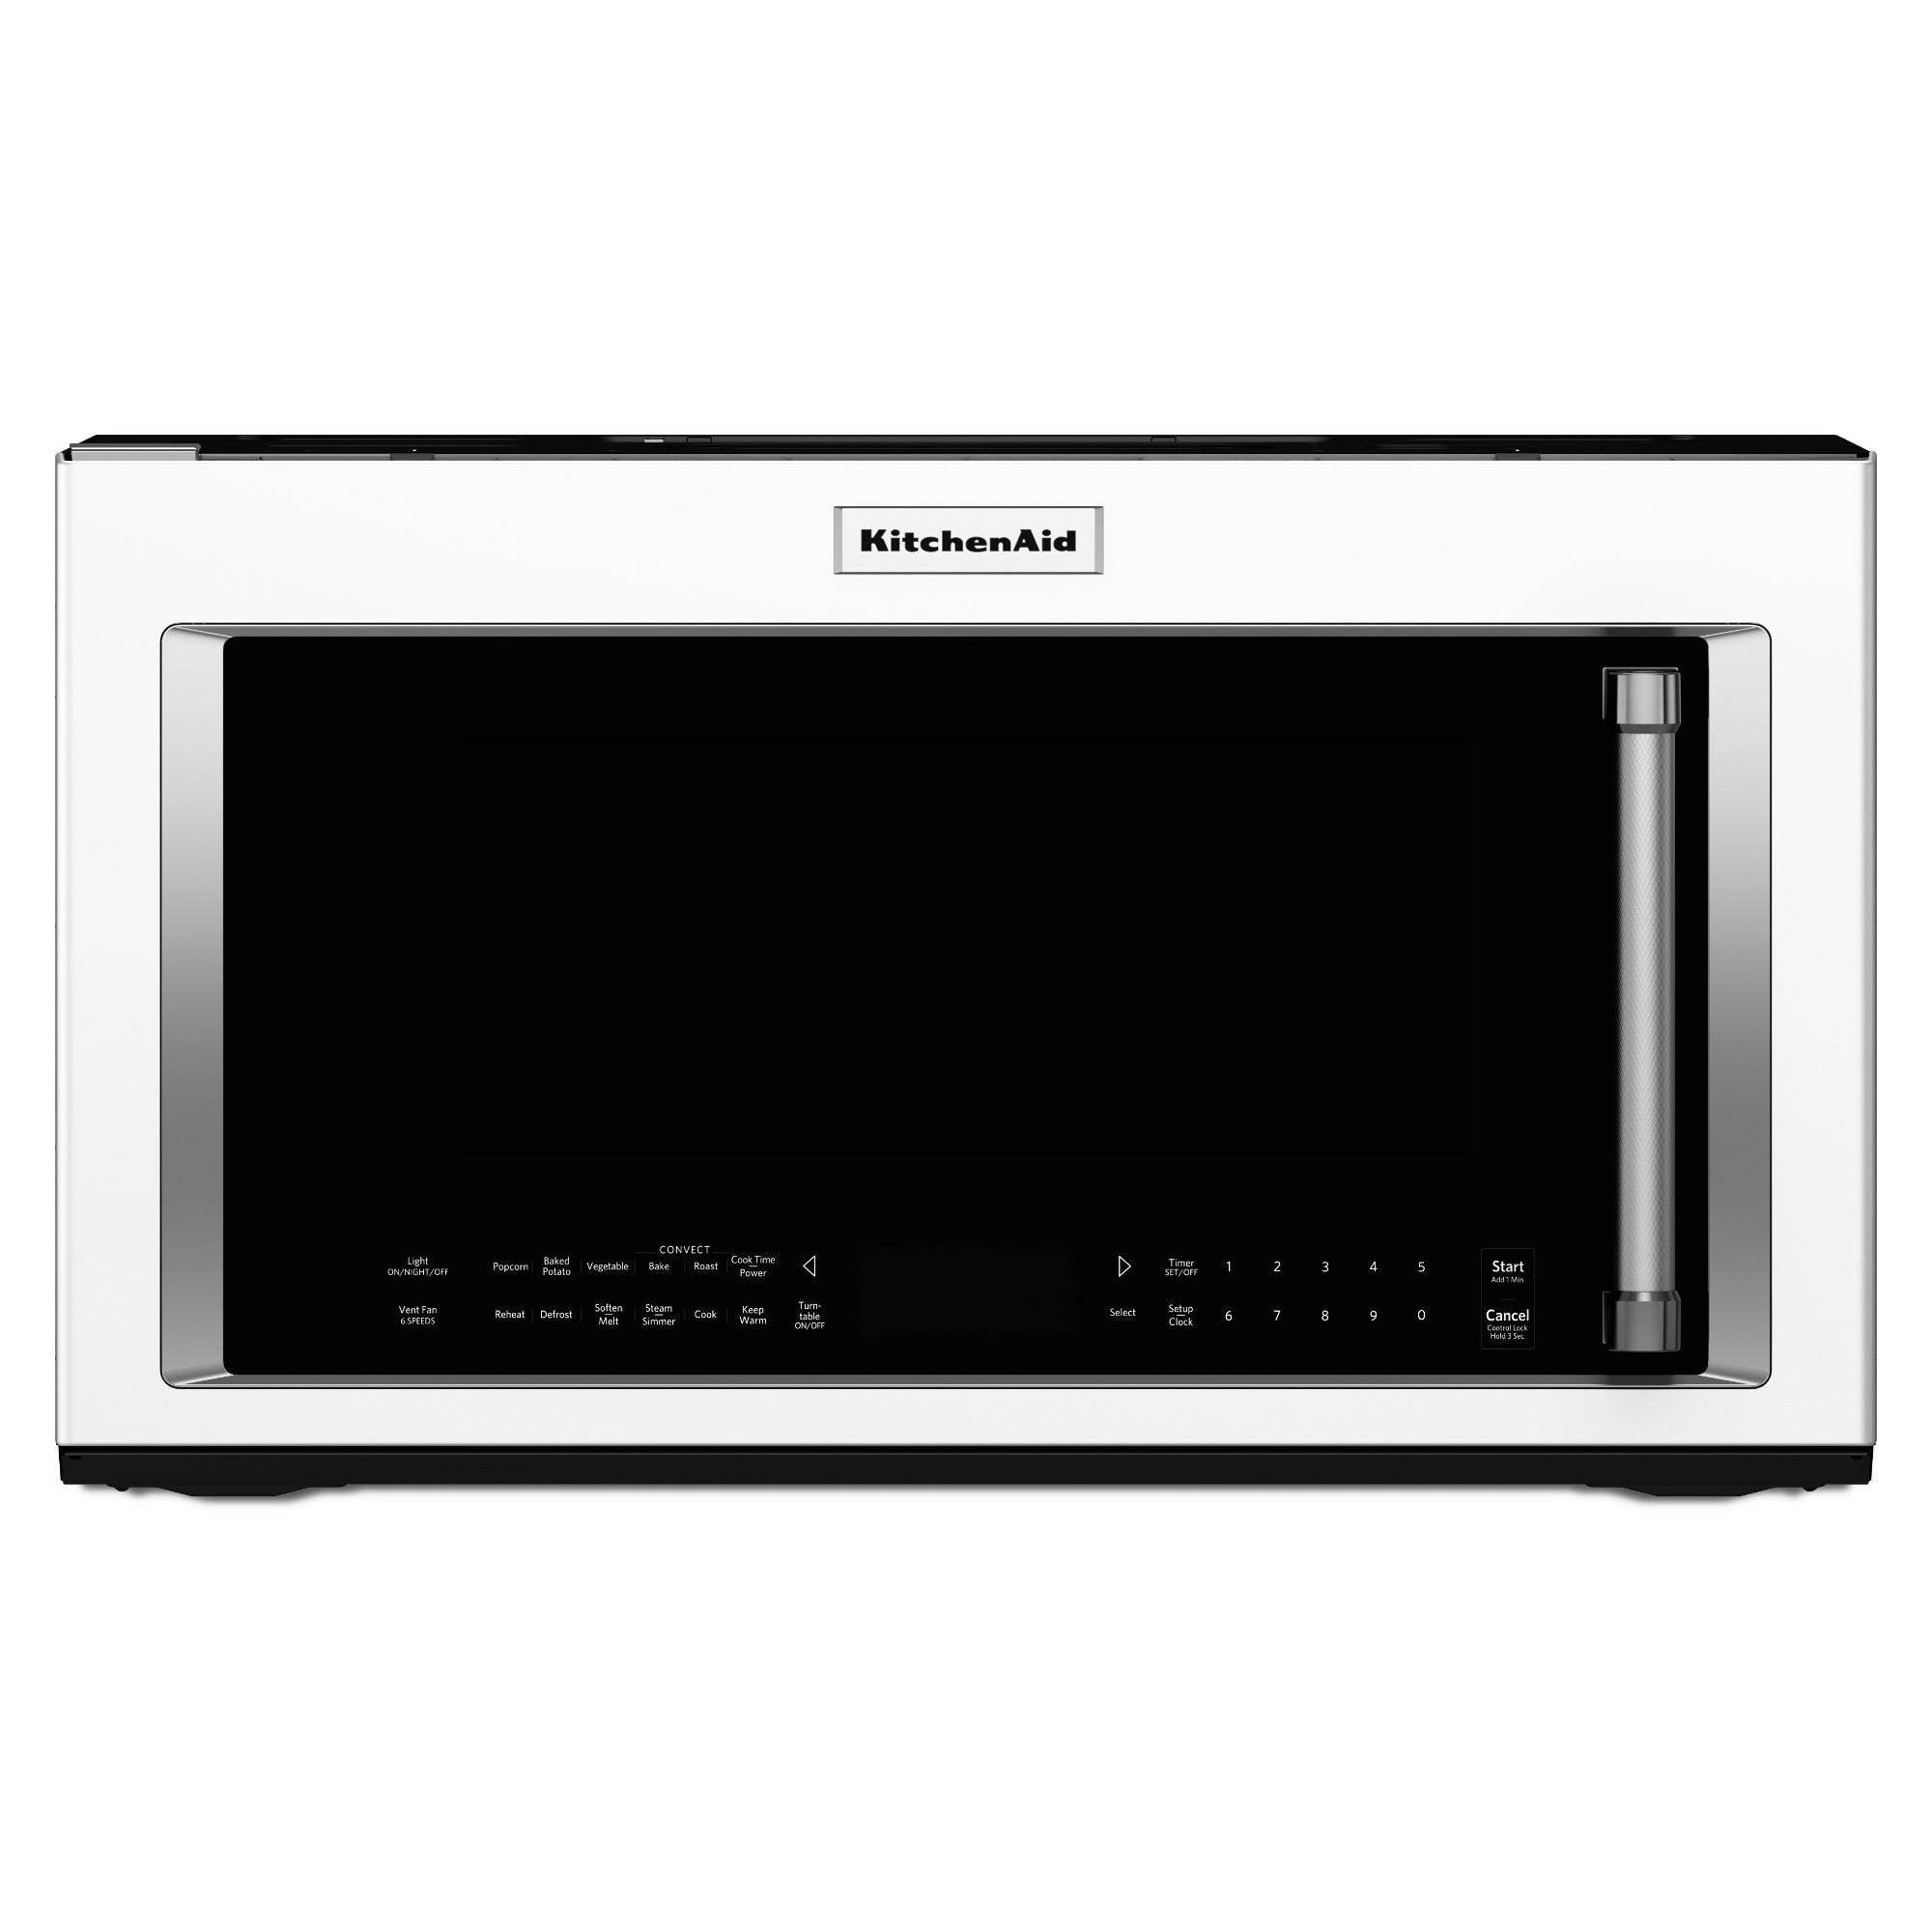 KitchenAid KMHC319EWH 1.9 cu. ft. 1000W Convection Microwave Oven - White